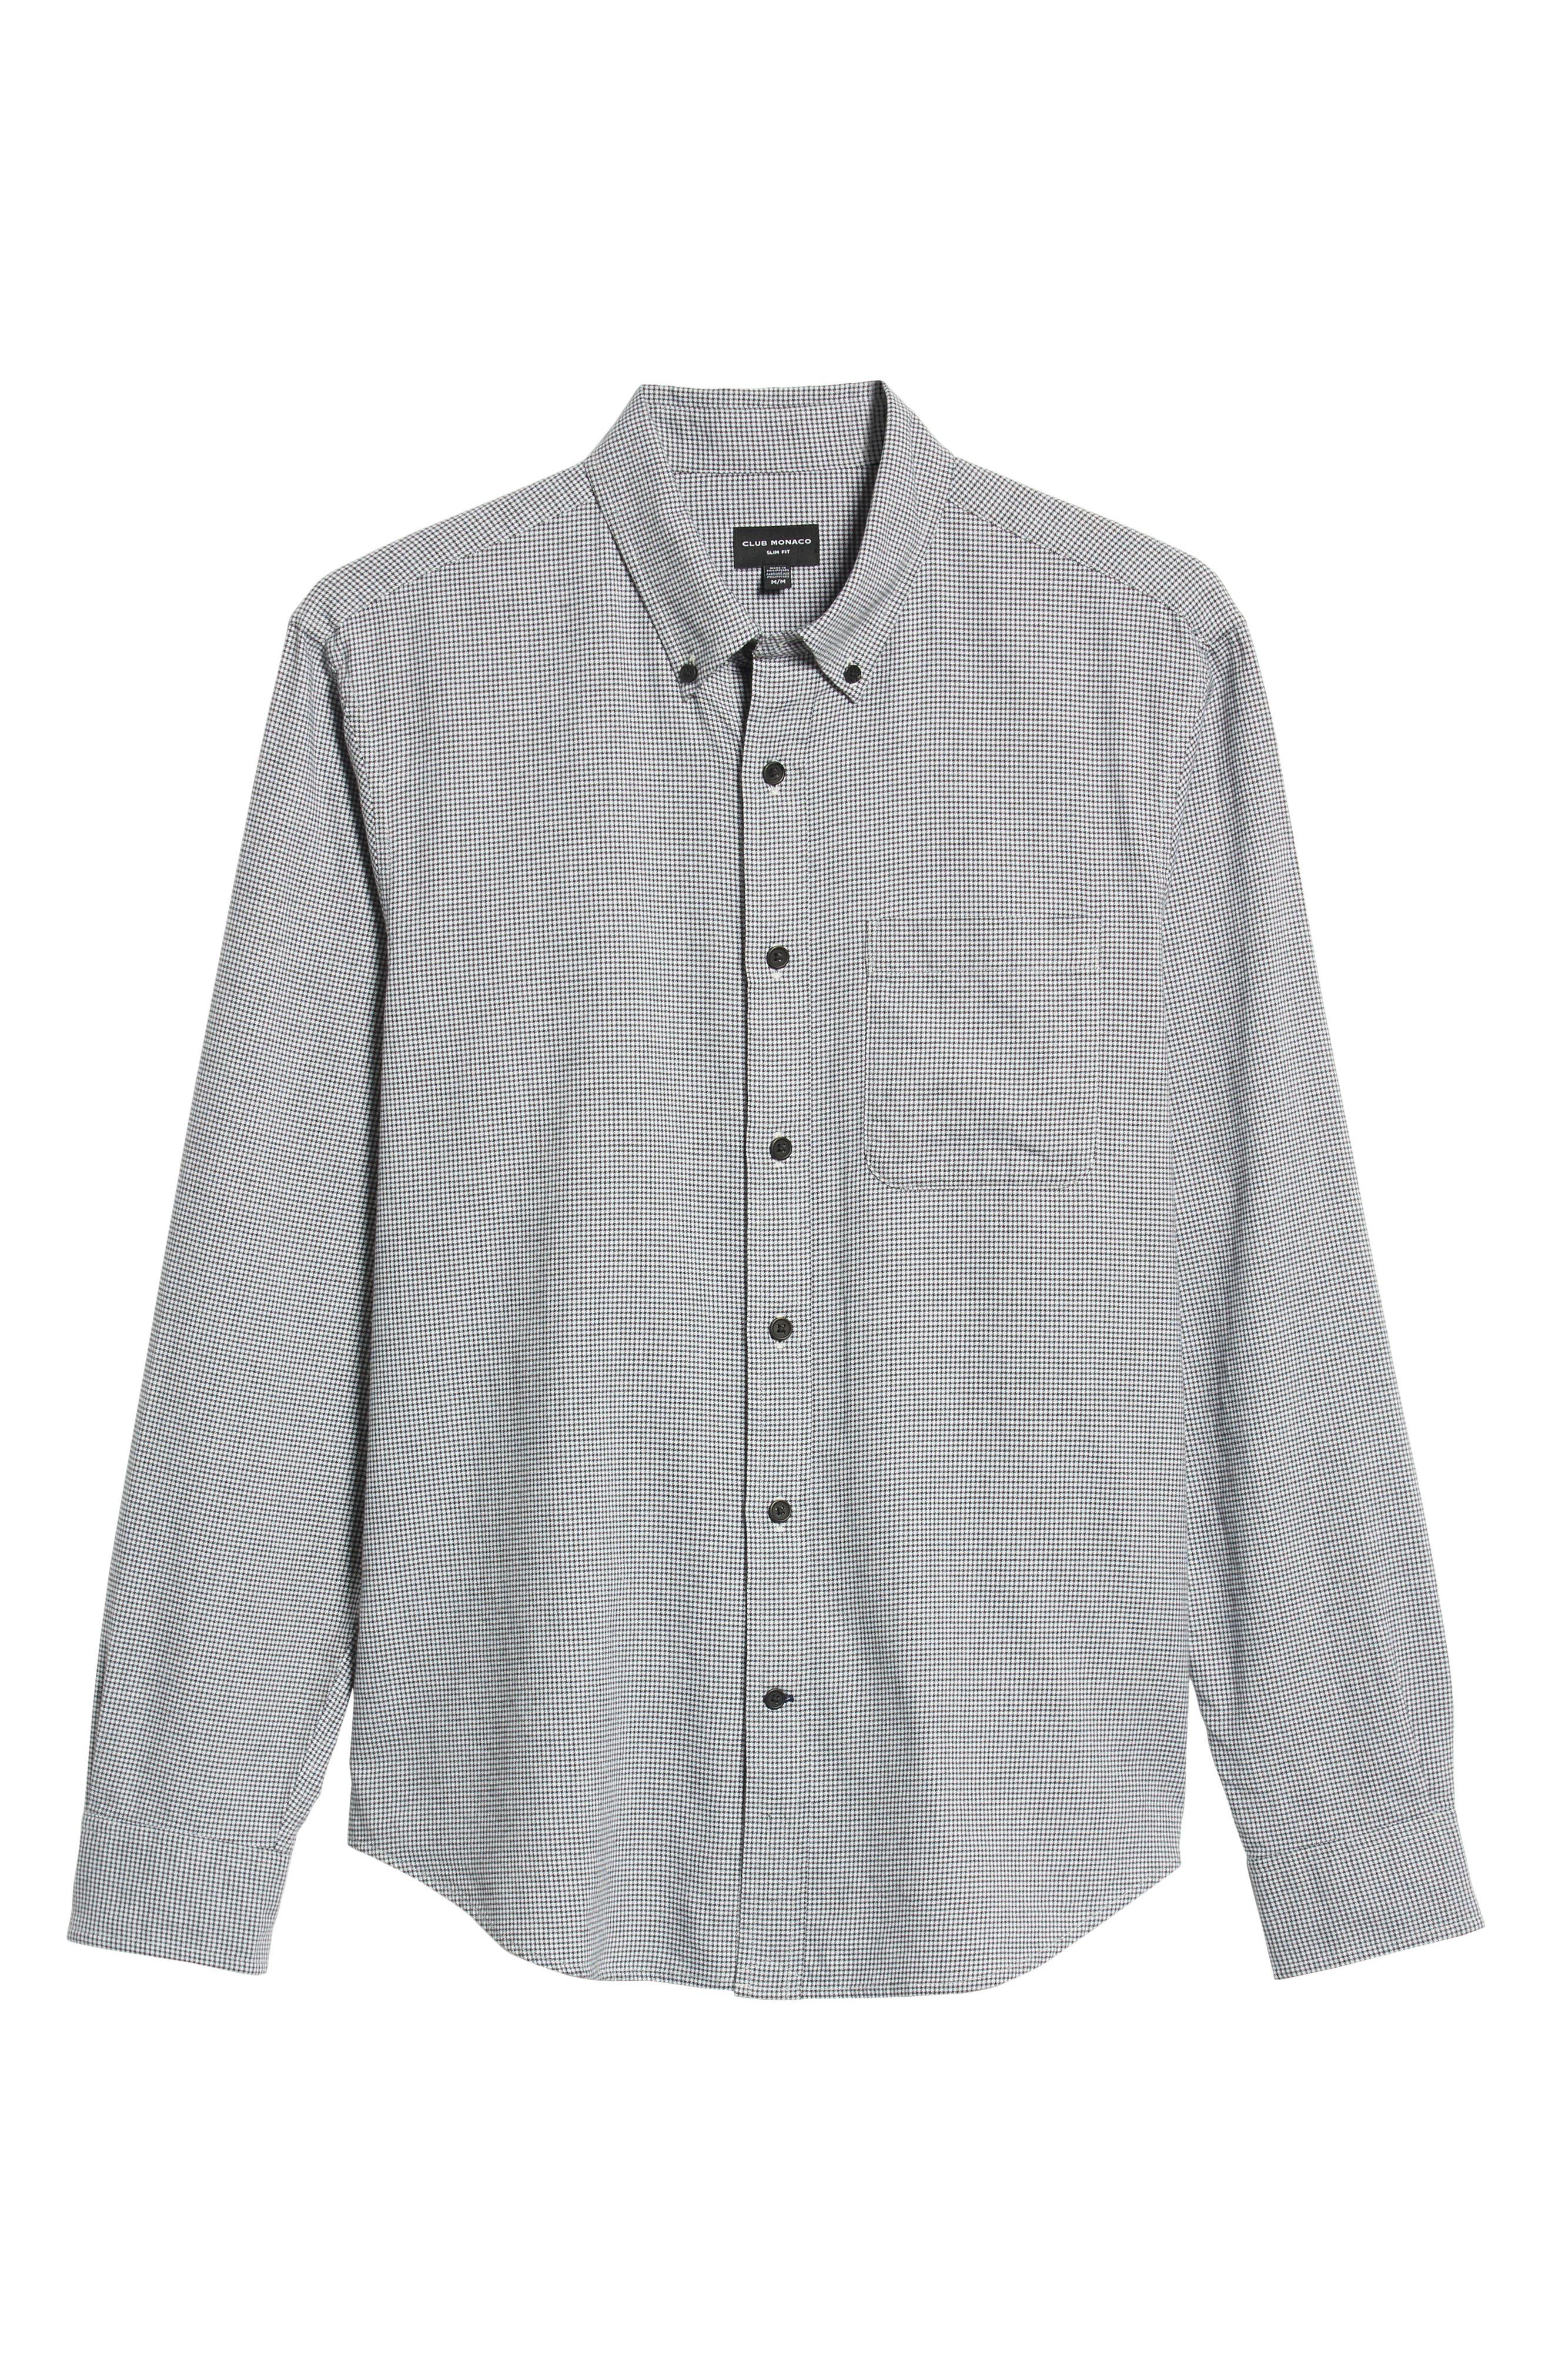 Trim Fit Houndstooth Flannel Sport Shirt,                             Alternate thumbnail 5, color,                             010